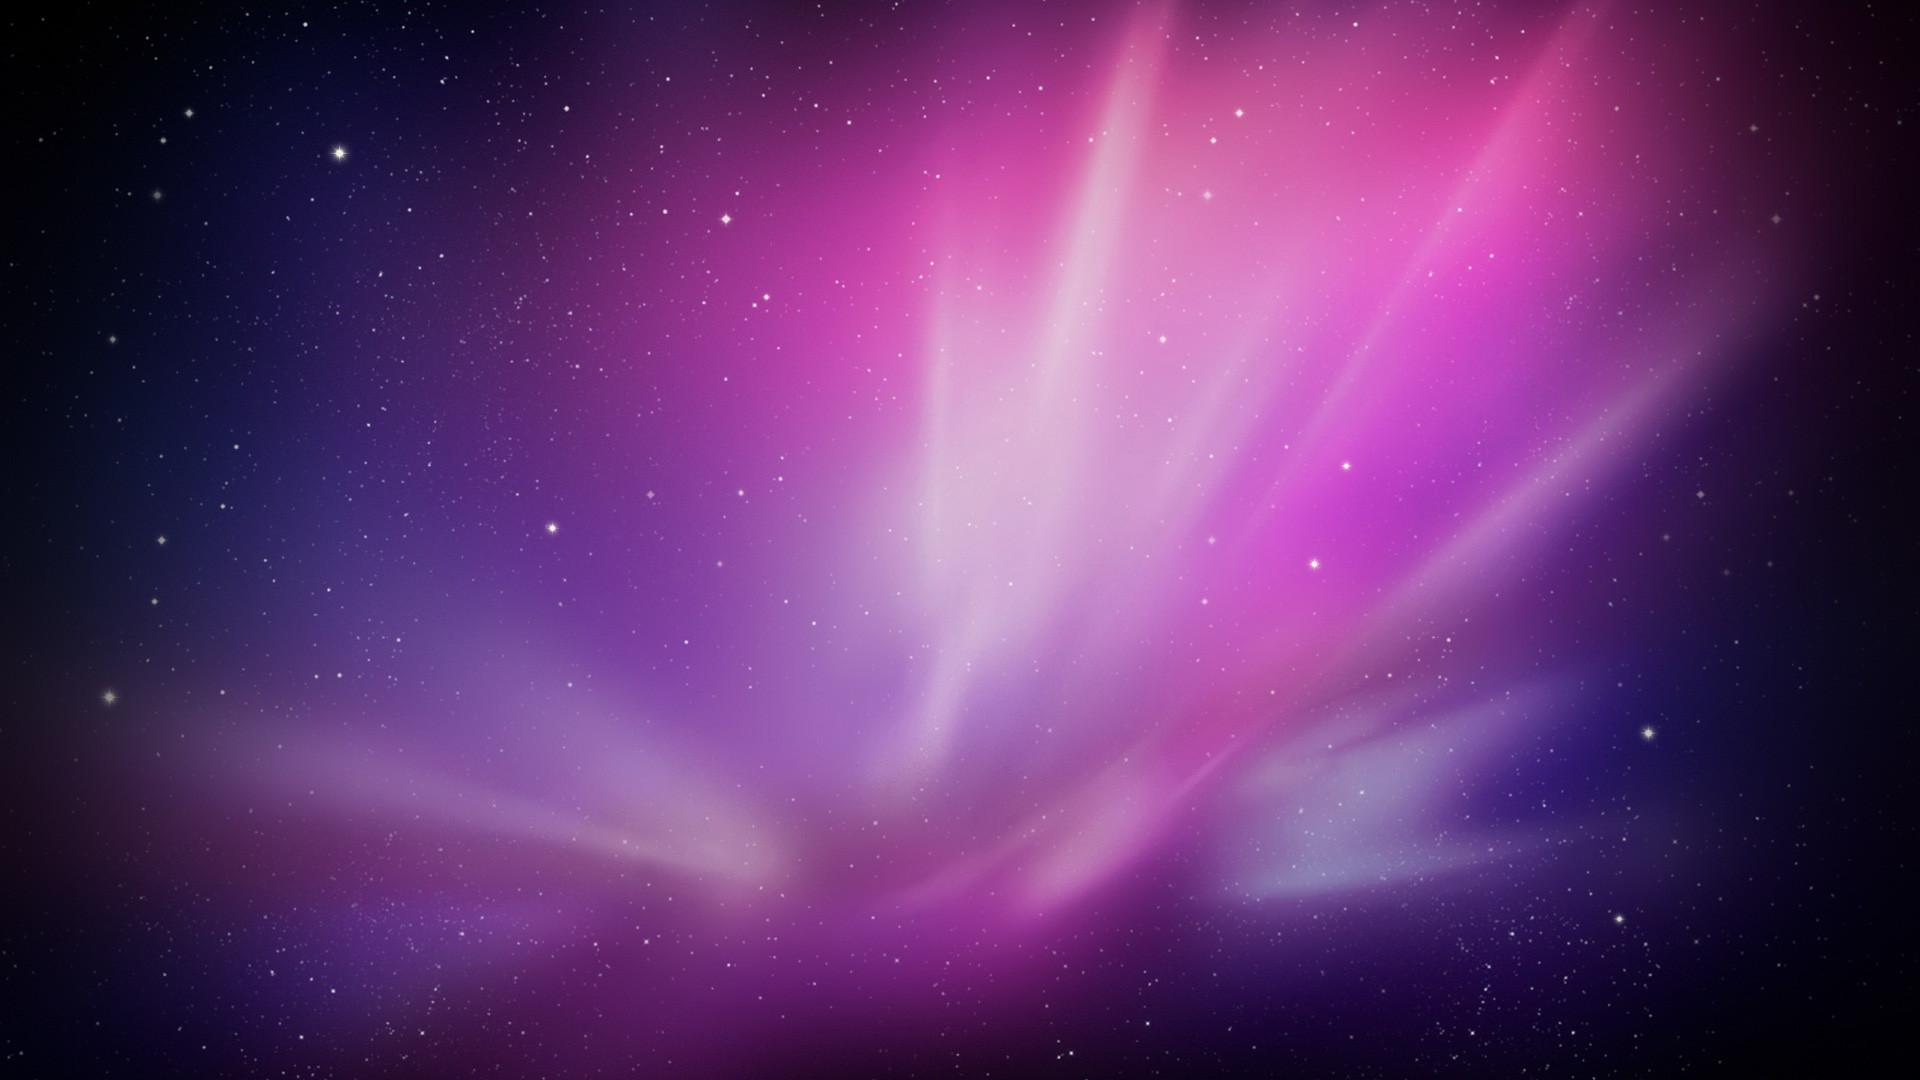 1080p   Full HD Wallpapers, download 1080p desktop backgrounds – Part .